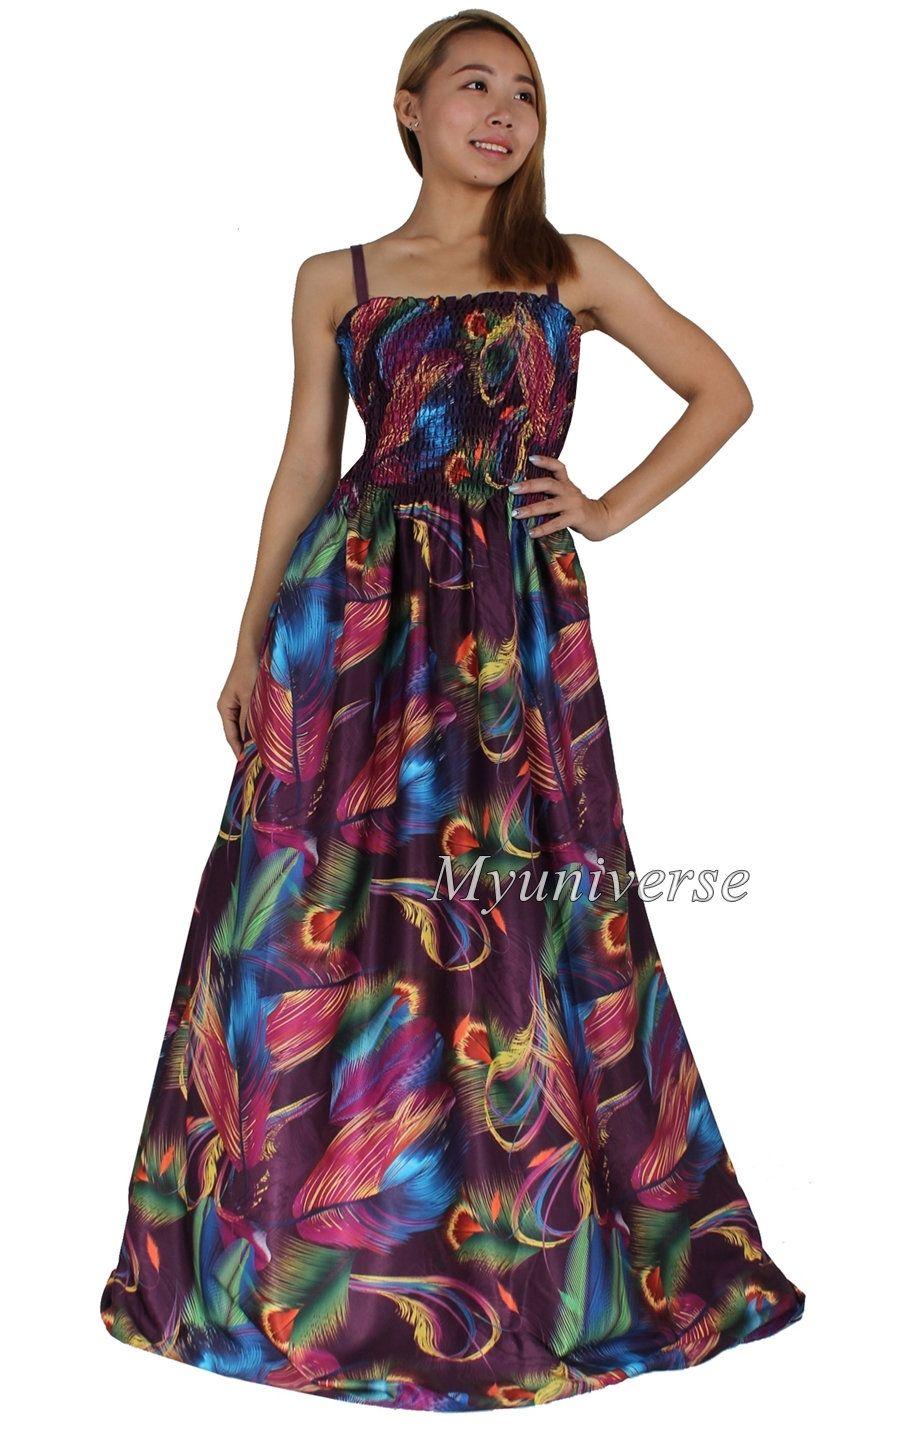 Plus Size Maxi Dress Women Summer Floral Casual Long Party Clothing Long Hawaiian Floor